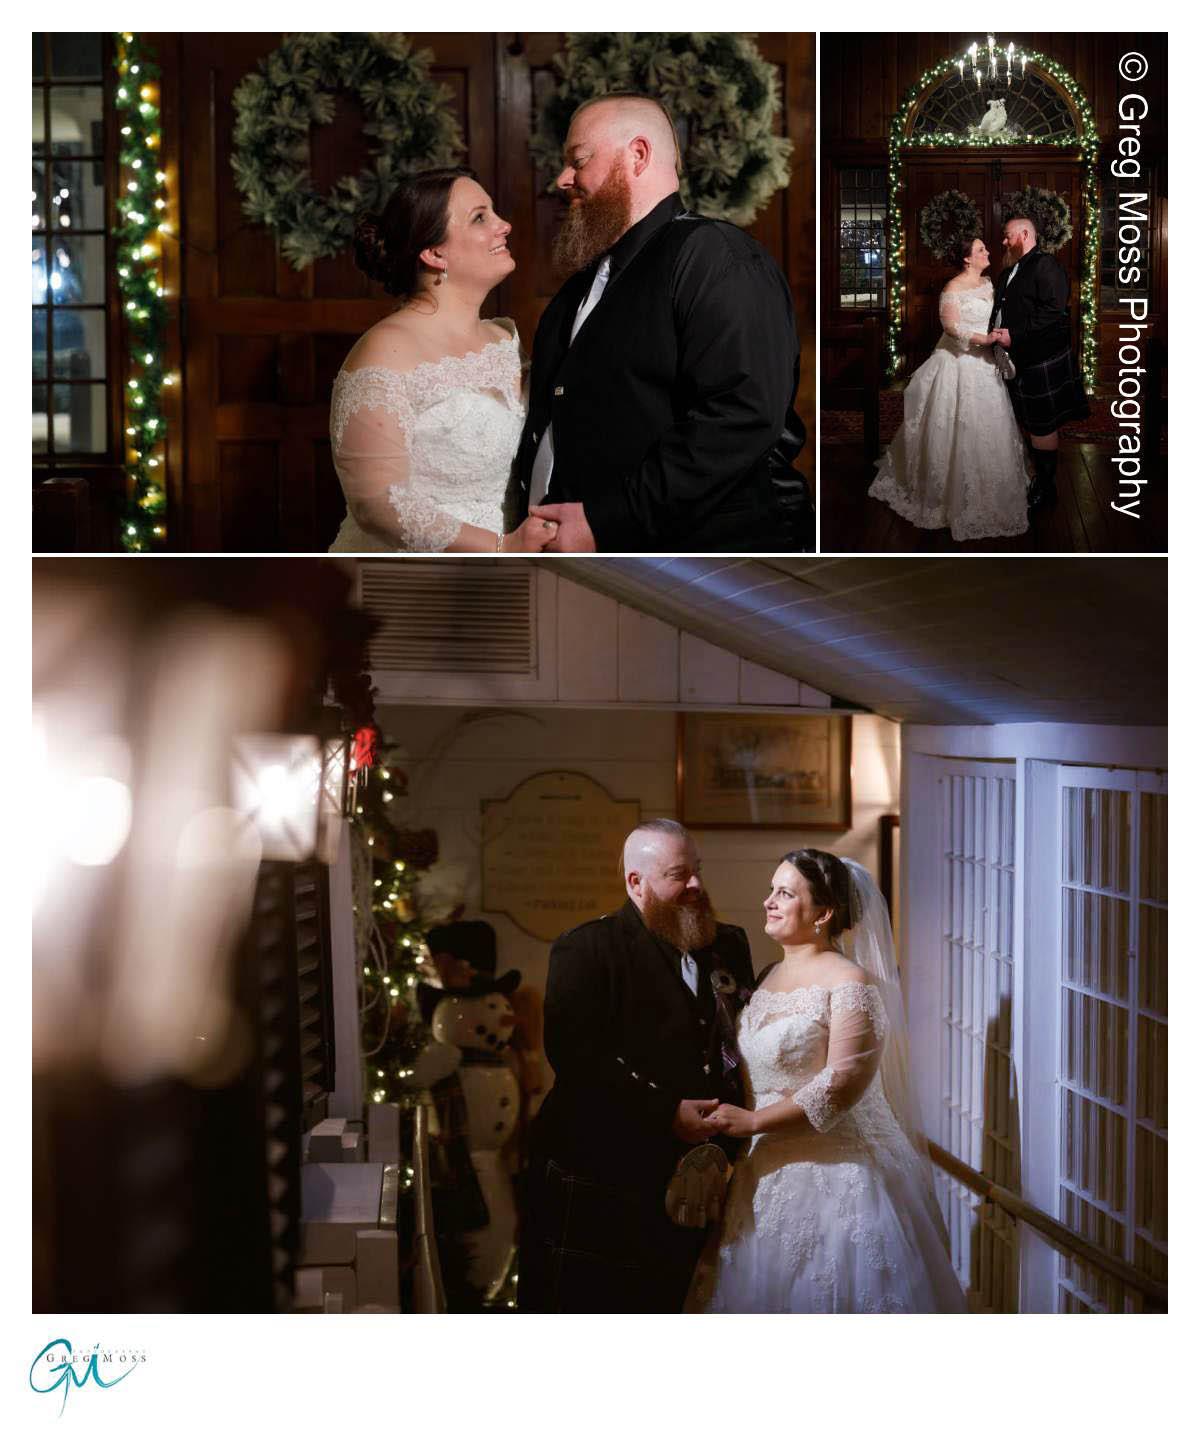 Night bridea and groom photo